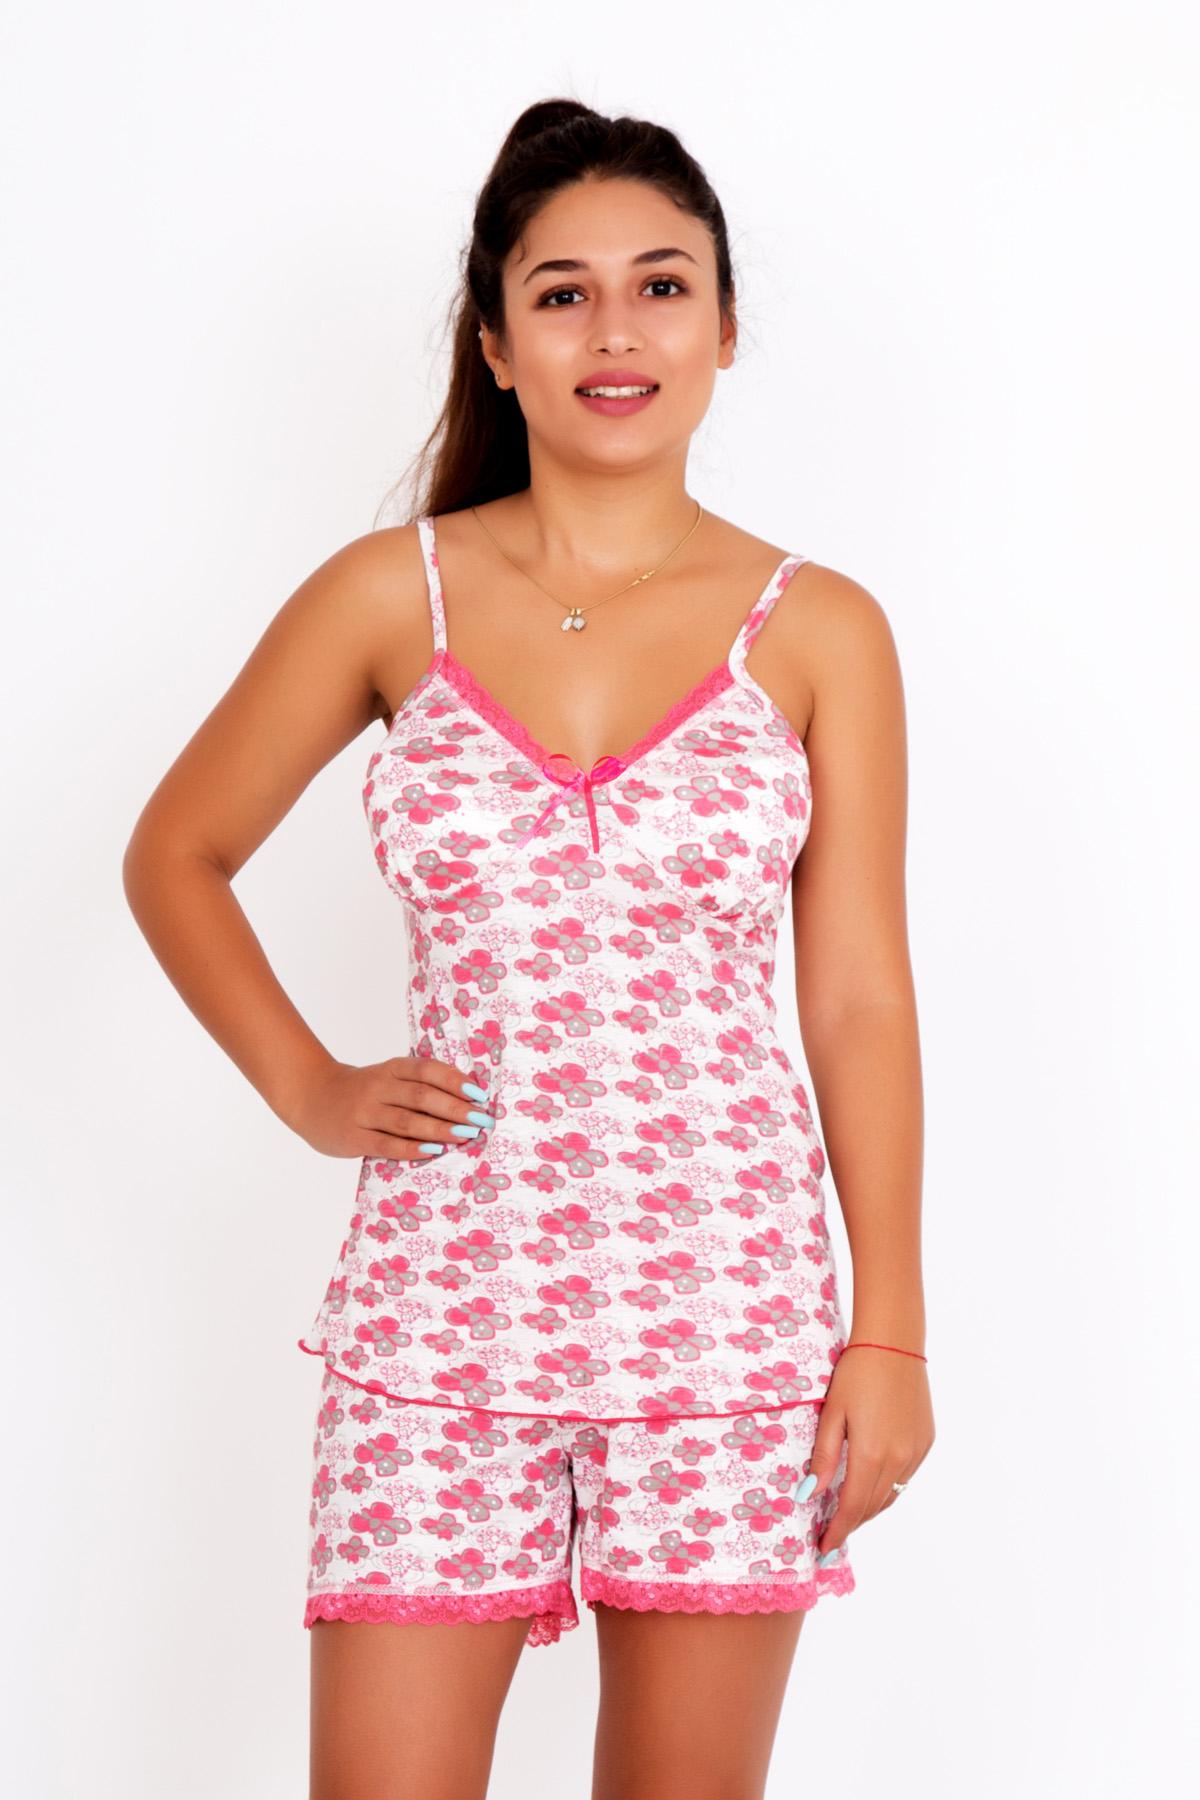 Женский пижама Капучино, размер 46Пижамы<br>Обхват груди:92 см<br>Обхват талии:74 см<br>Обхват бедер:100 см<br>Рост:167 см<br><br>Тип: Жен. костюм<br>Размер: 46<br>Материал: Вискоза